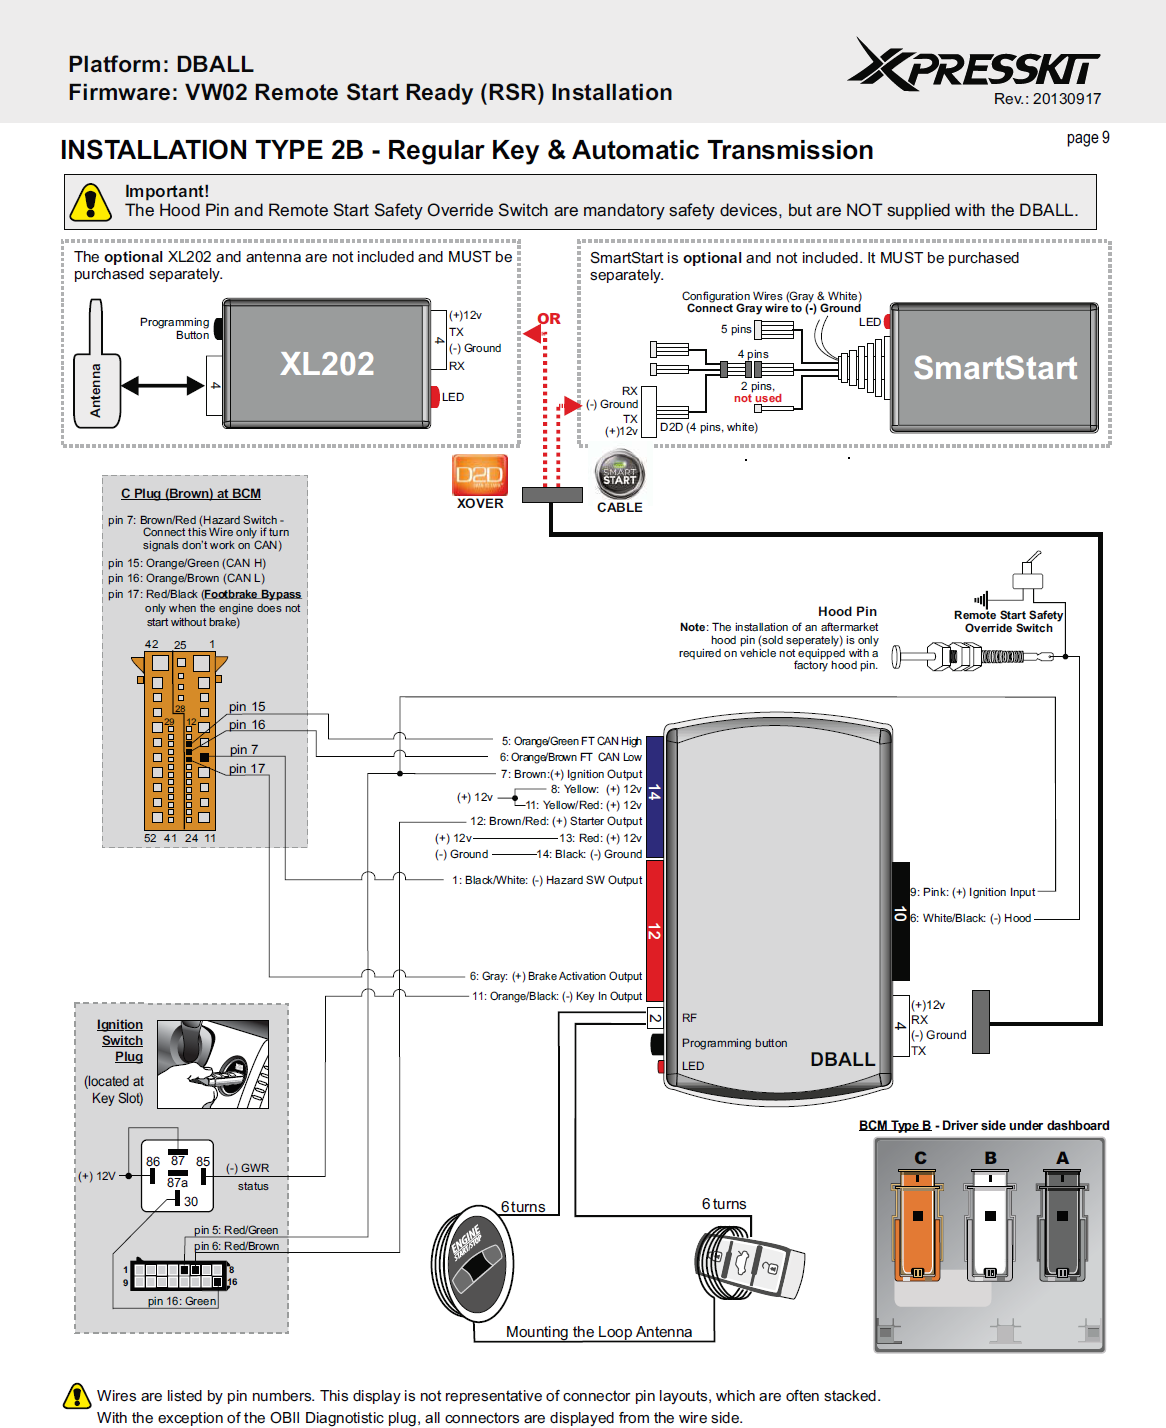 viper-5101-remote-start-wiring-diagram-2 Vehicle Wiring Diagrams For Installing Remote Starters on